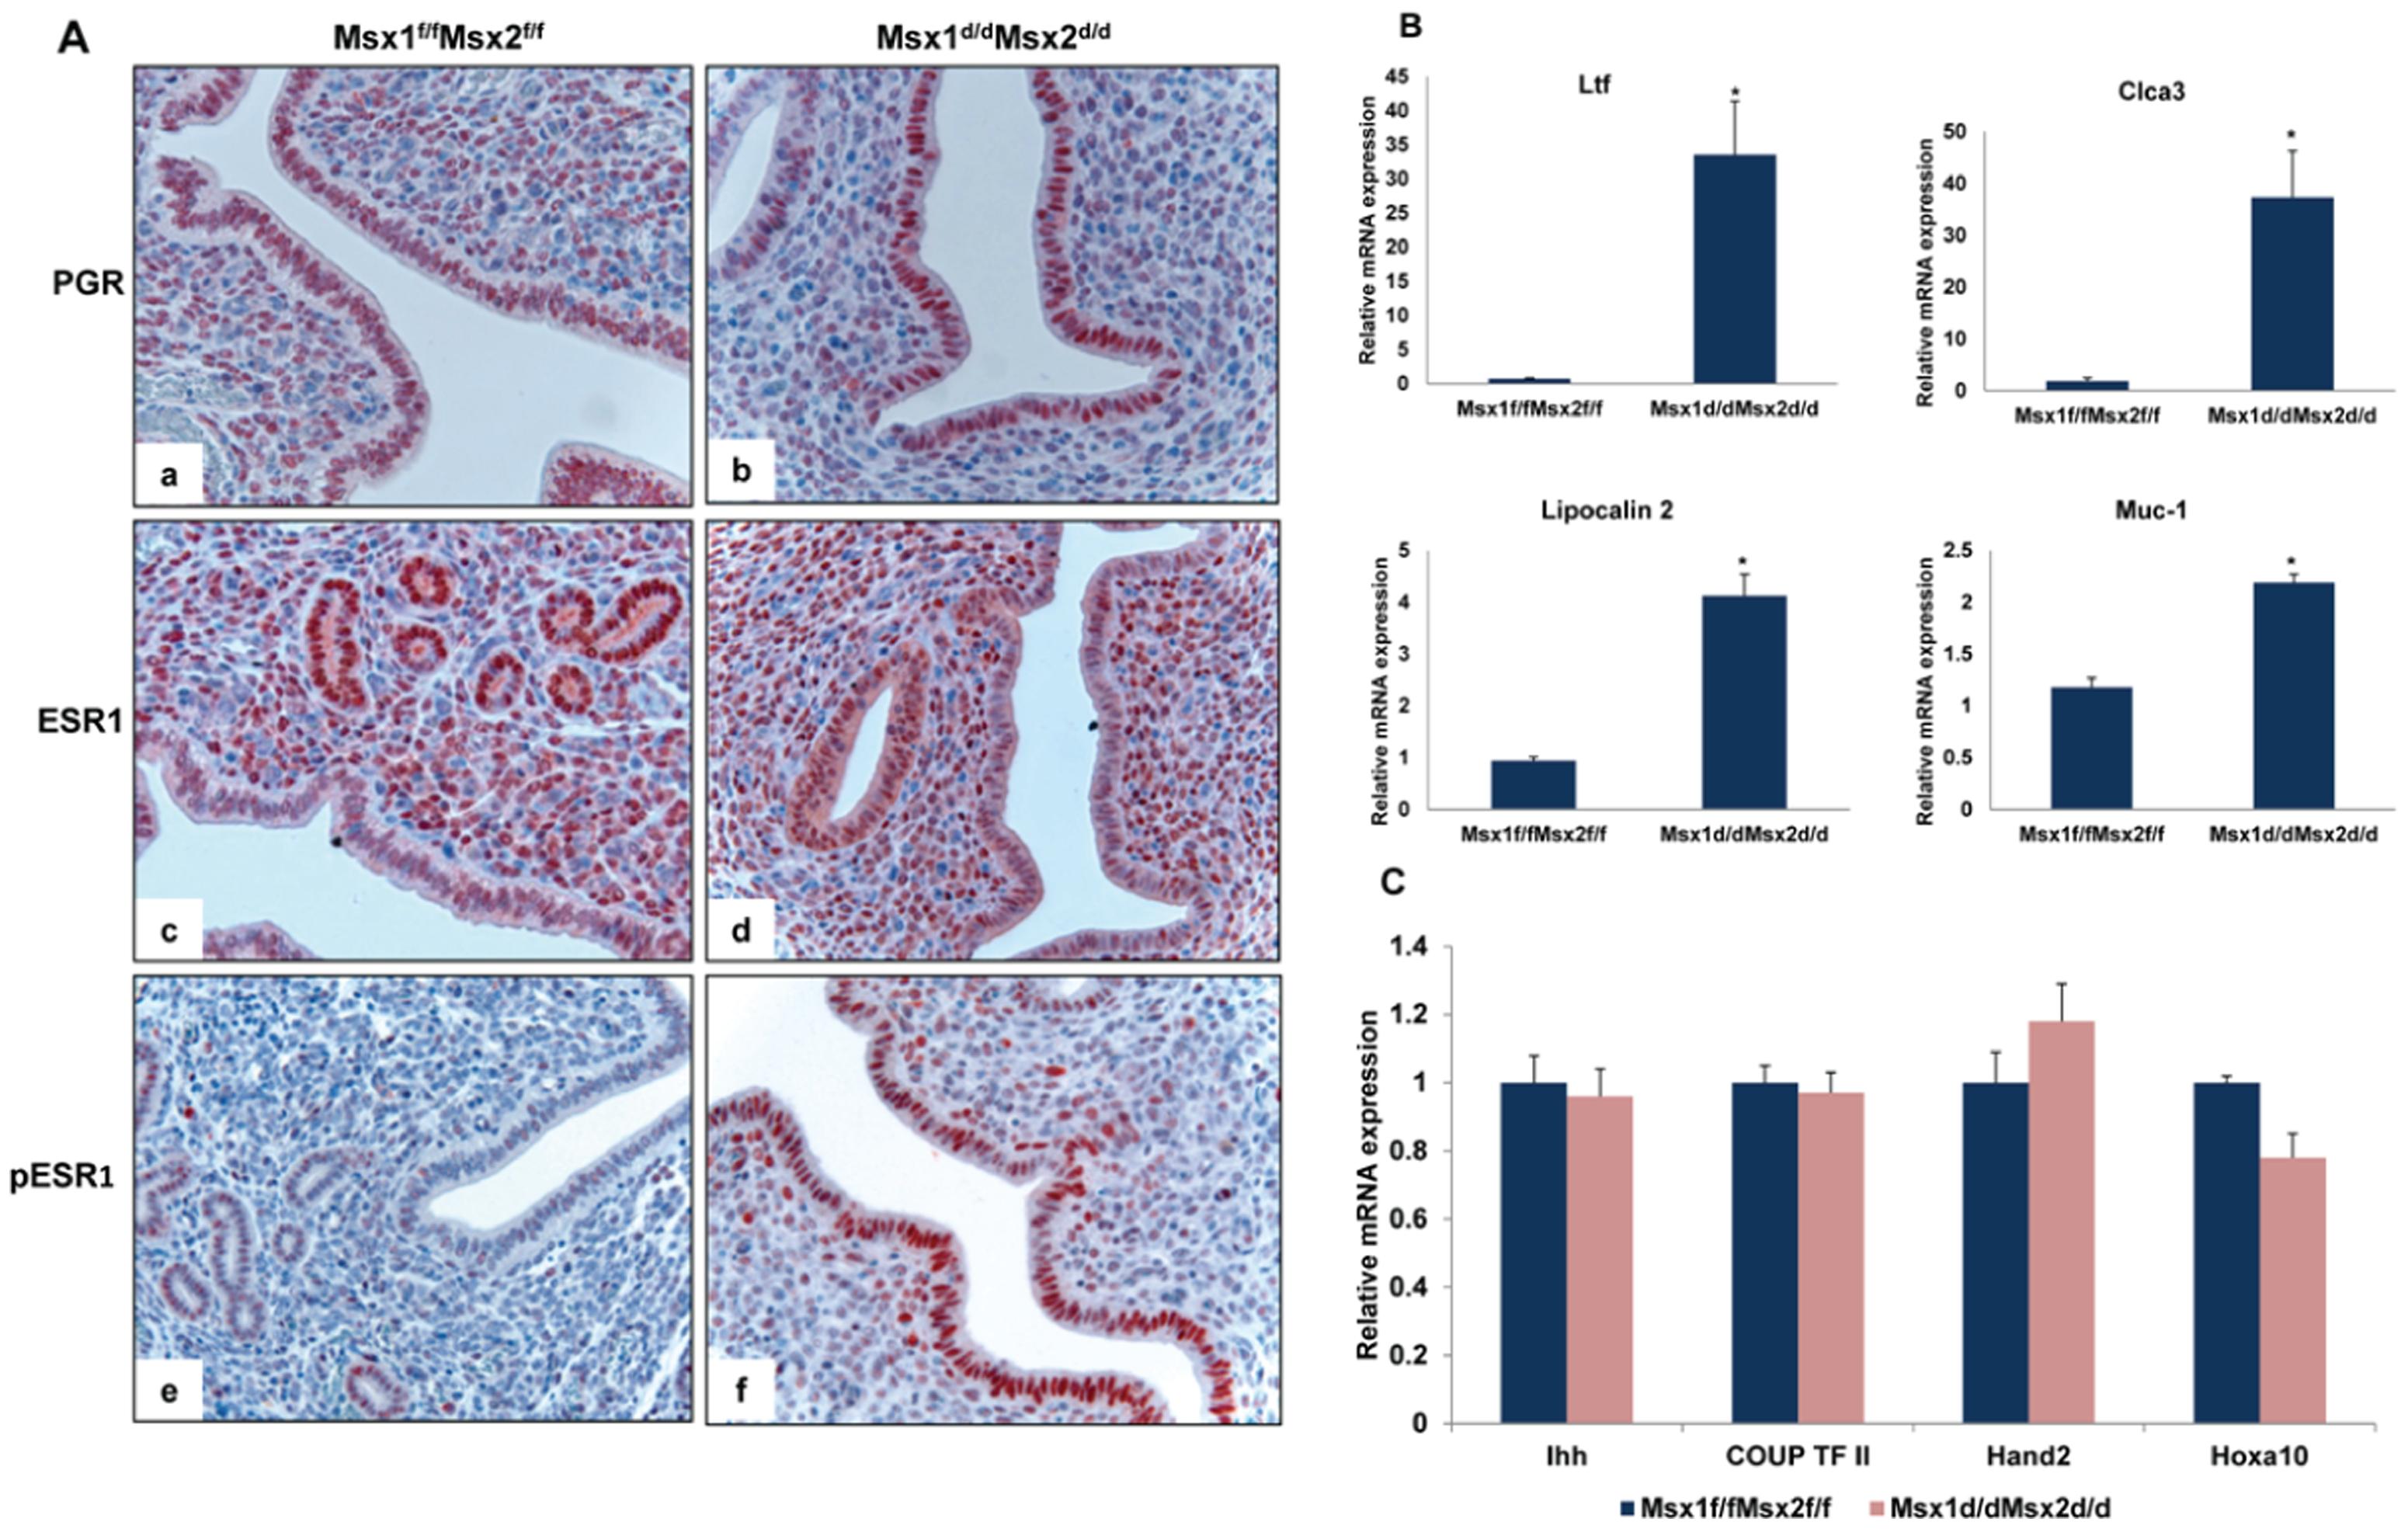 Enhanced ESR1 activity in the luminal epithelium of <i>Msx1<sup>d/d</sup>Msx2<sup>d/d</sup></i> uteri.